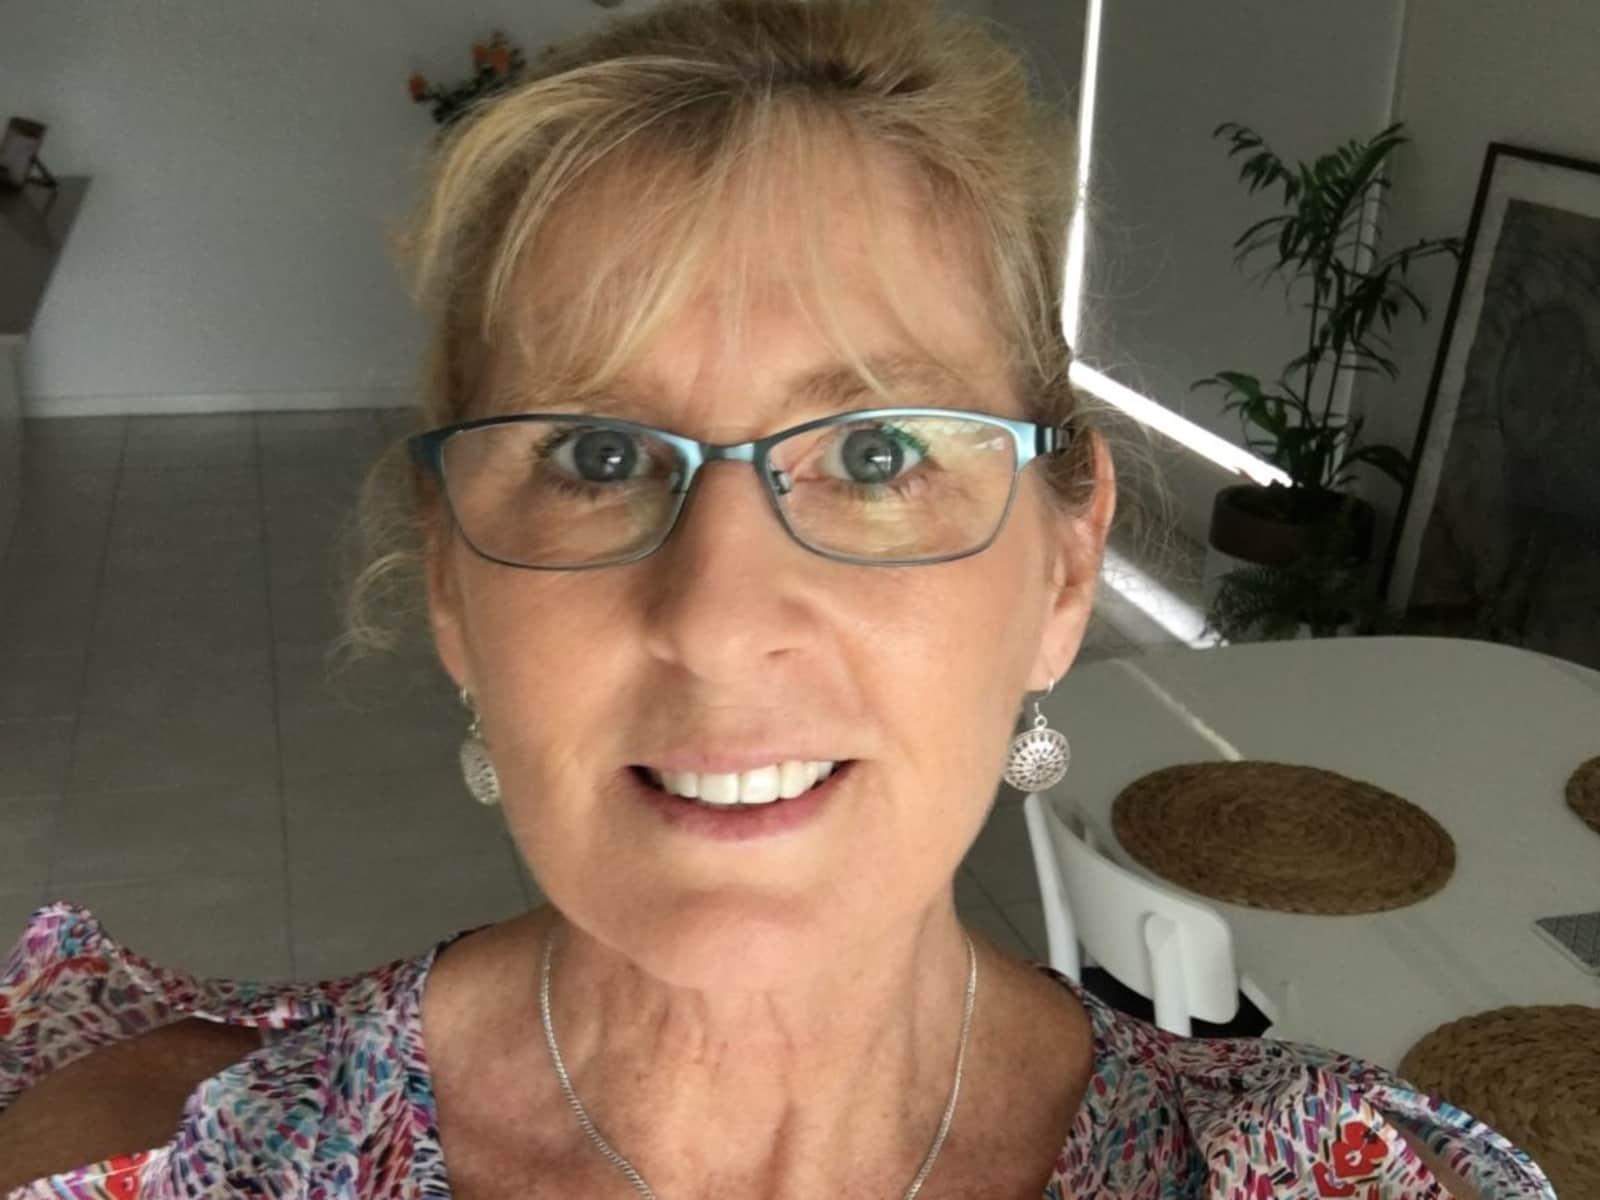 Sharyn from Gold Coast, Queensland, Australia